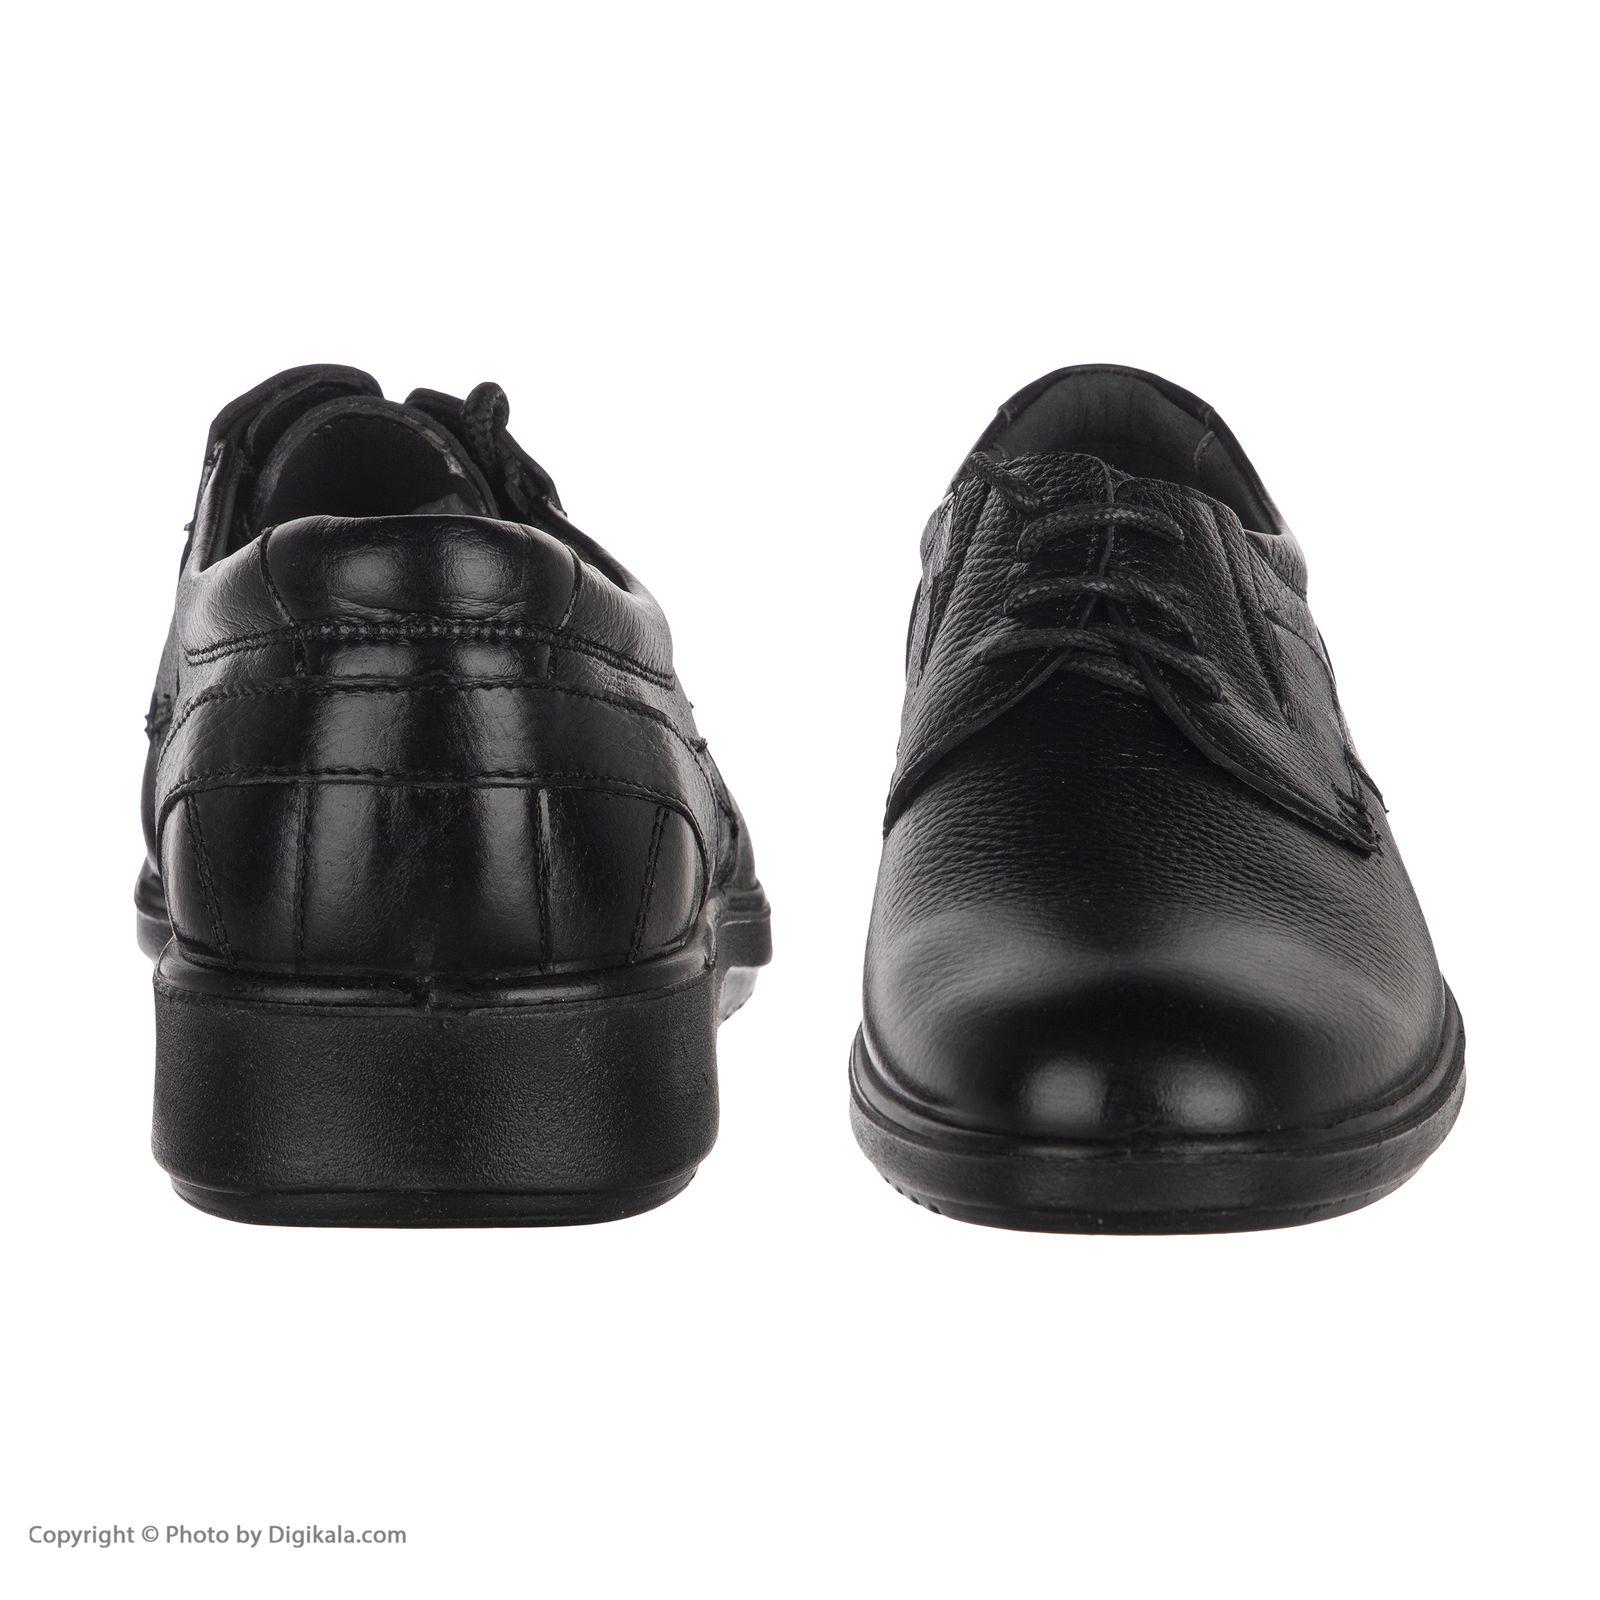 کفش روزمره مردانه آذر پلاس مدل 9438B503101 -  - 5